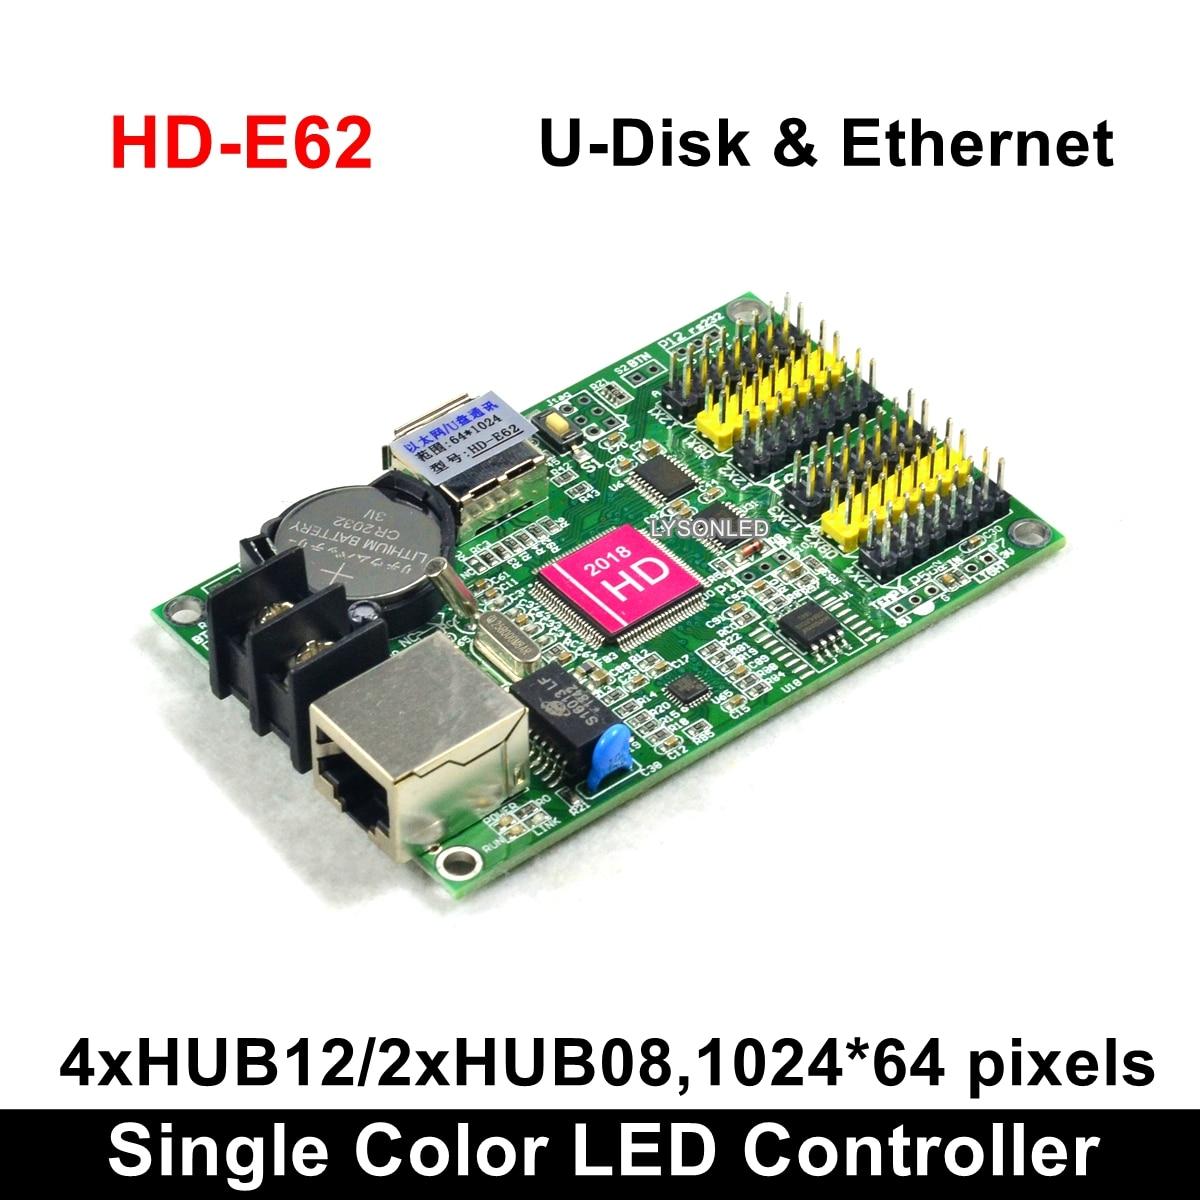 HD2018 Software HD-E62 Huidu P10 Monochrome LED Display Card,Single Color and Dual Color LED Controller (HD-E63 E64 on sale)HD2018 Software HD-E62 Huidu P10 Monochrome LED Display Card,Single Color and Dual Color LED Controller (HD-E63 E64 on sale)